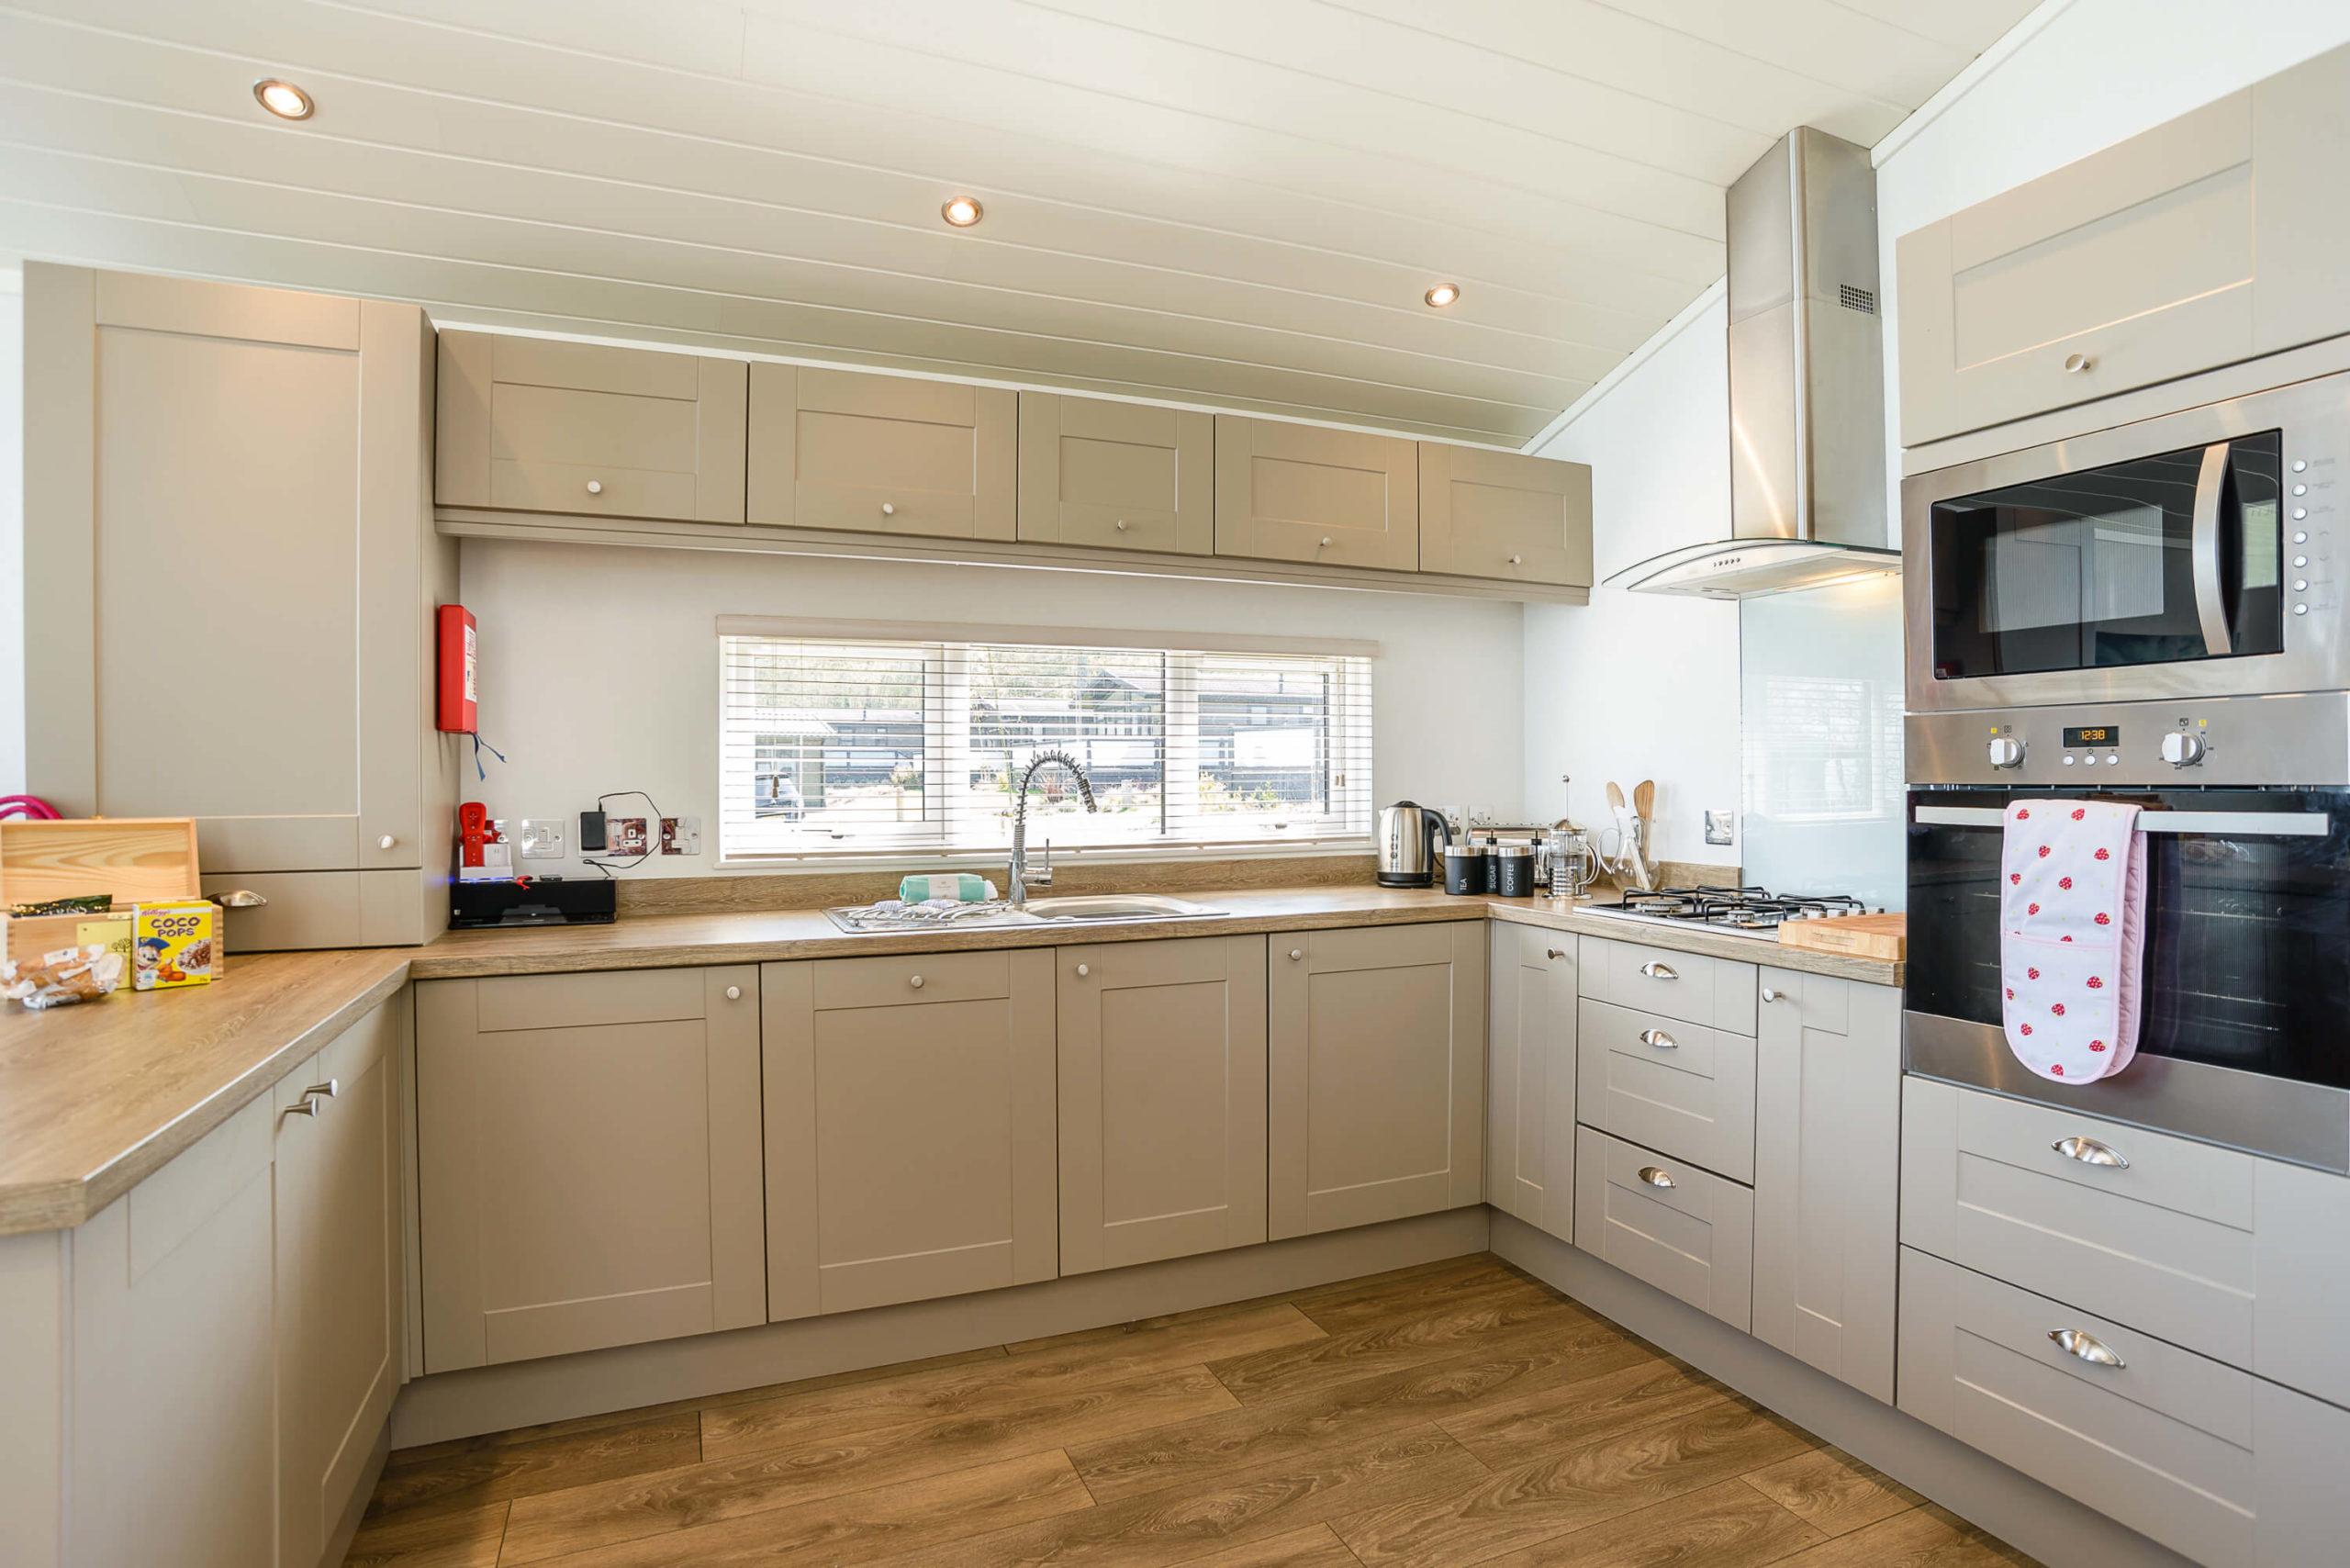 large open plan kitchen area